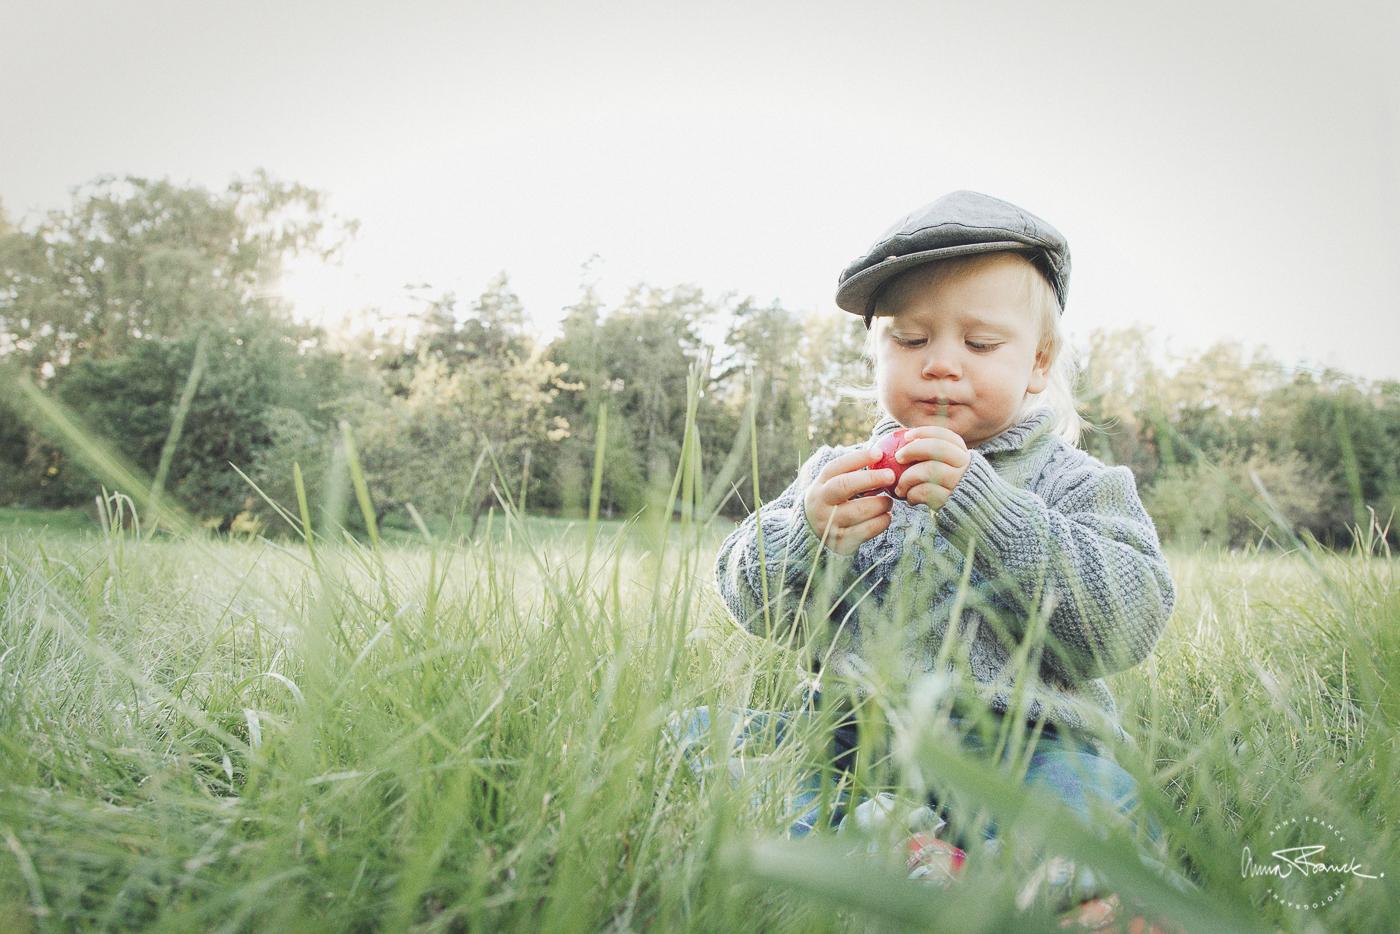 anna, franck, photography, kids, barnfotografering, lapsikuvaus, parainen, pargas, stockholm, spontant, naturligt, luonnollista, relaxed, softlight, natural, fun, roligt, fotograf